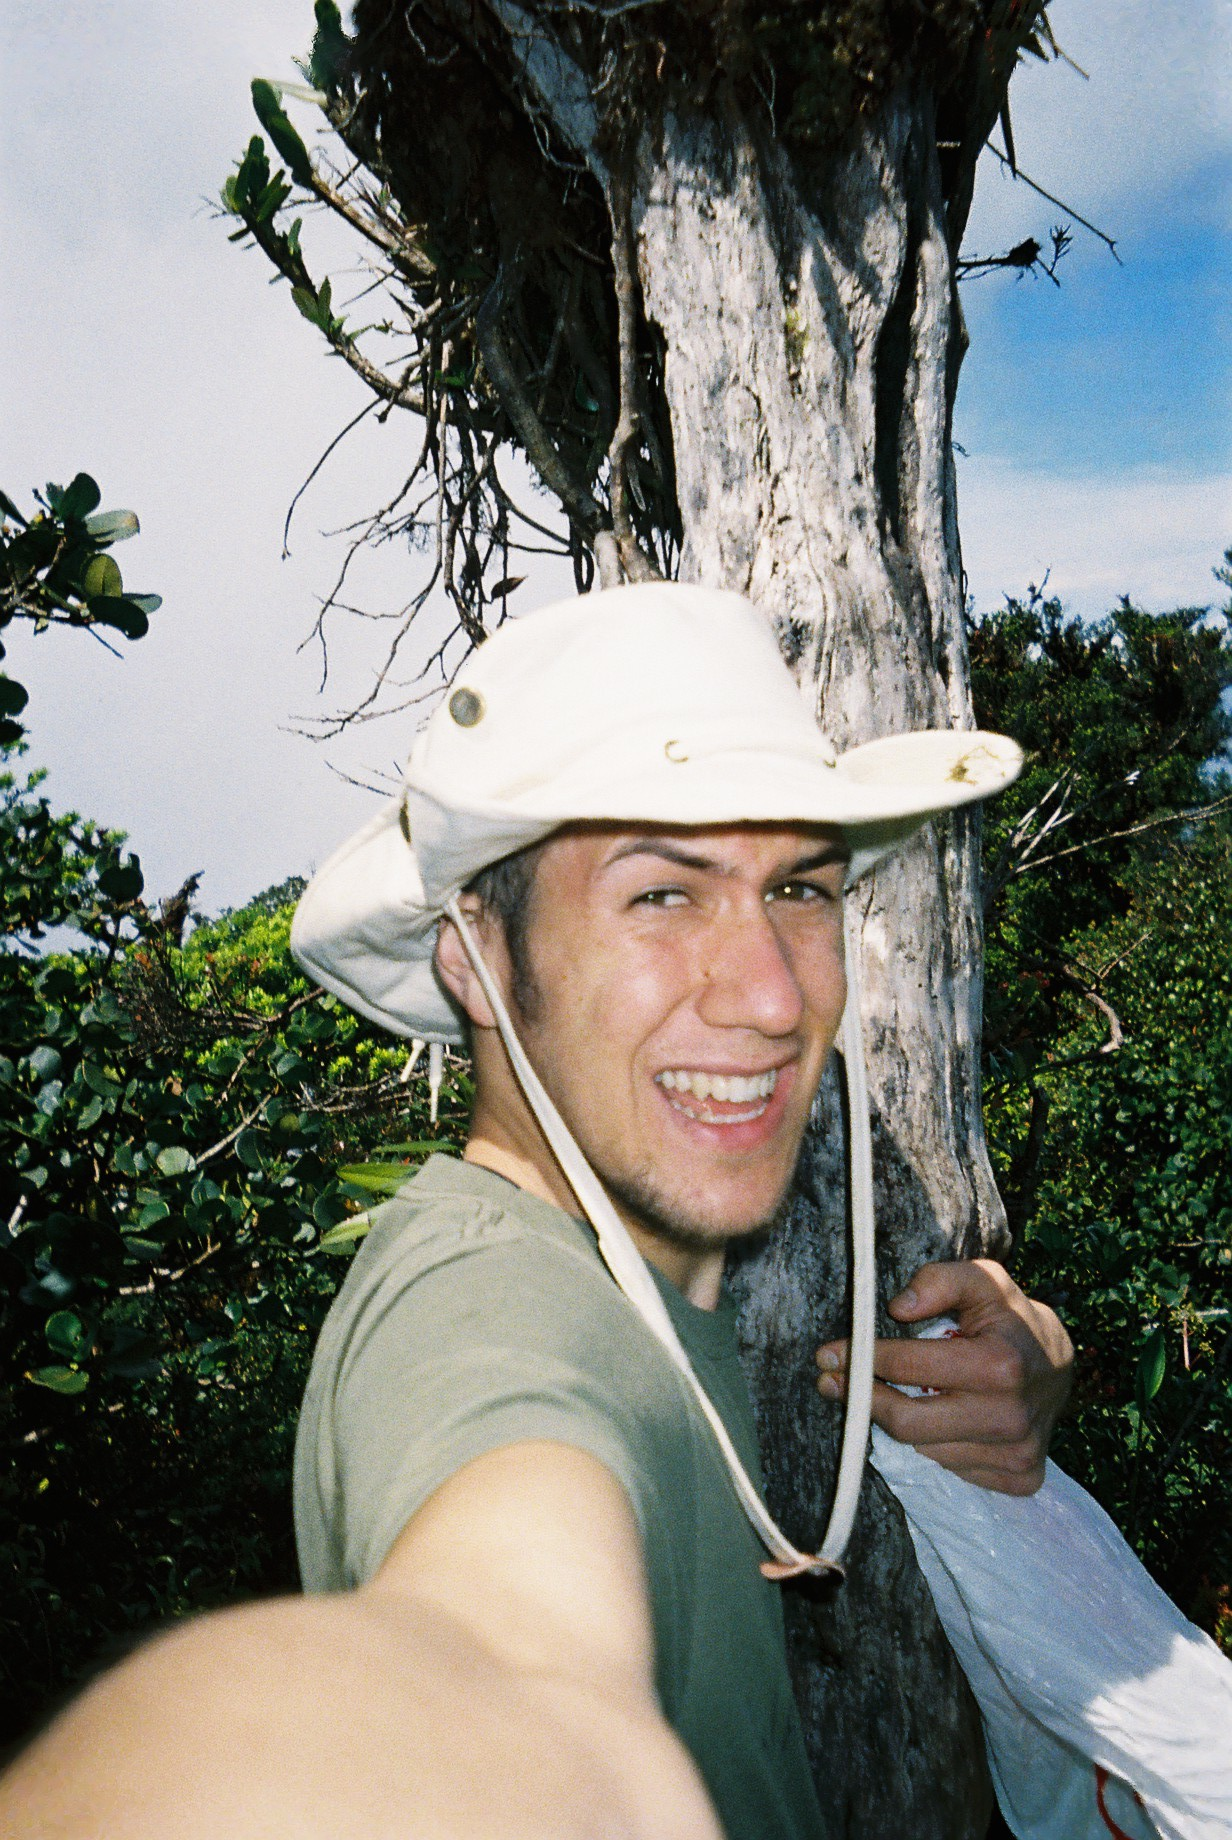 pre-jaguar selfie. ignore the ugly hat.